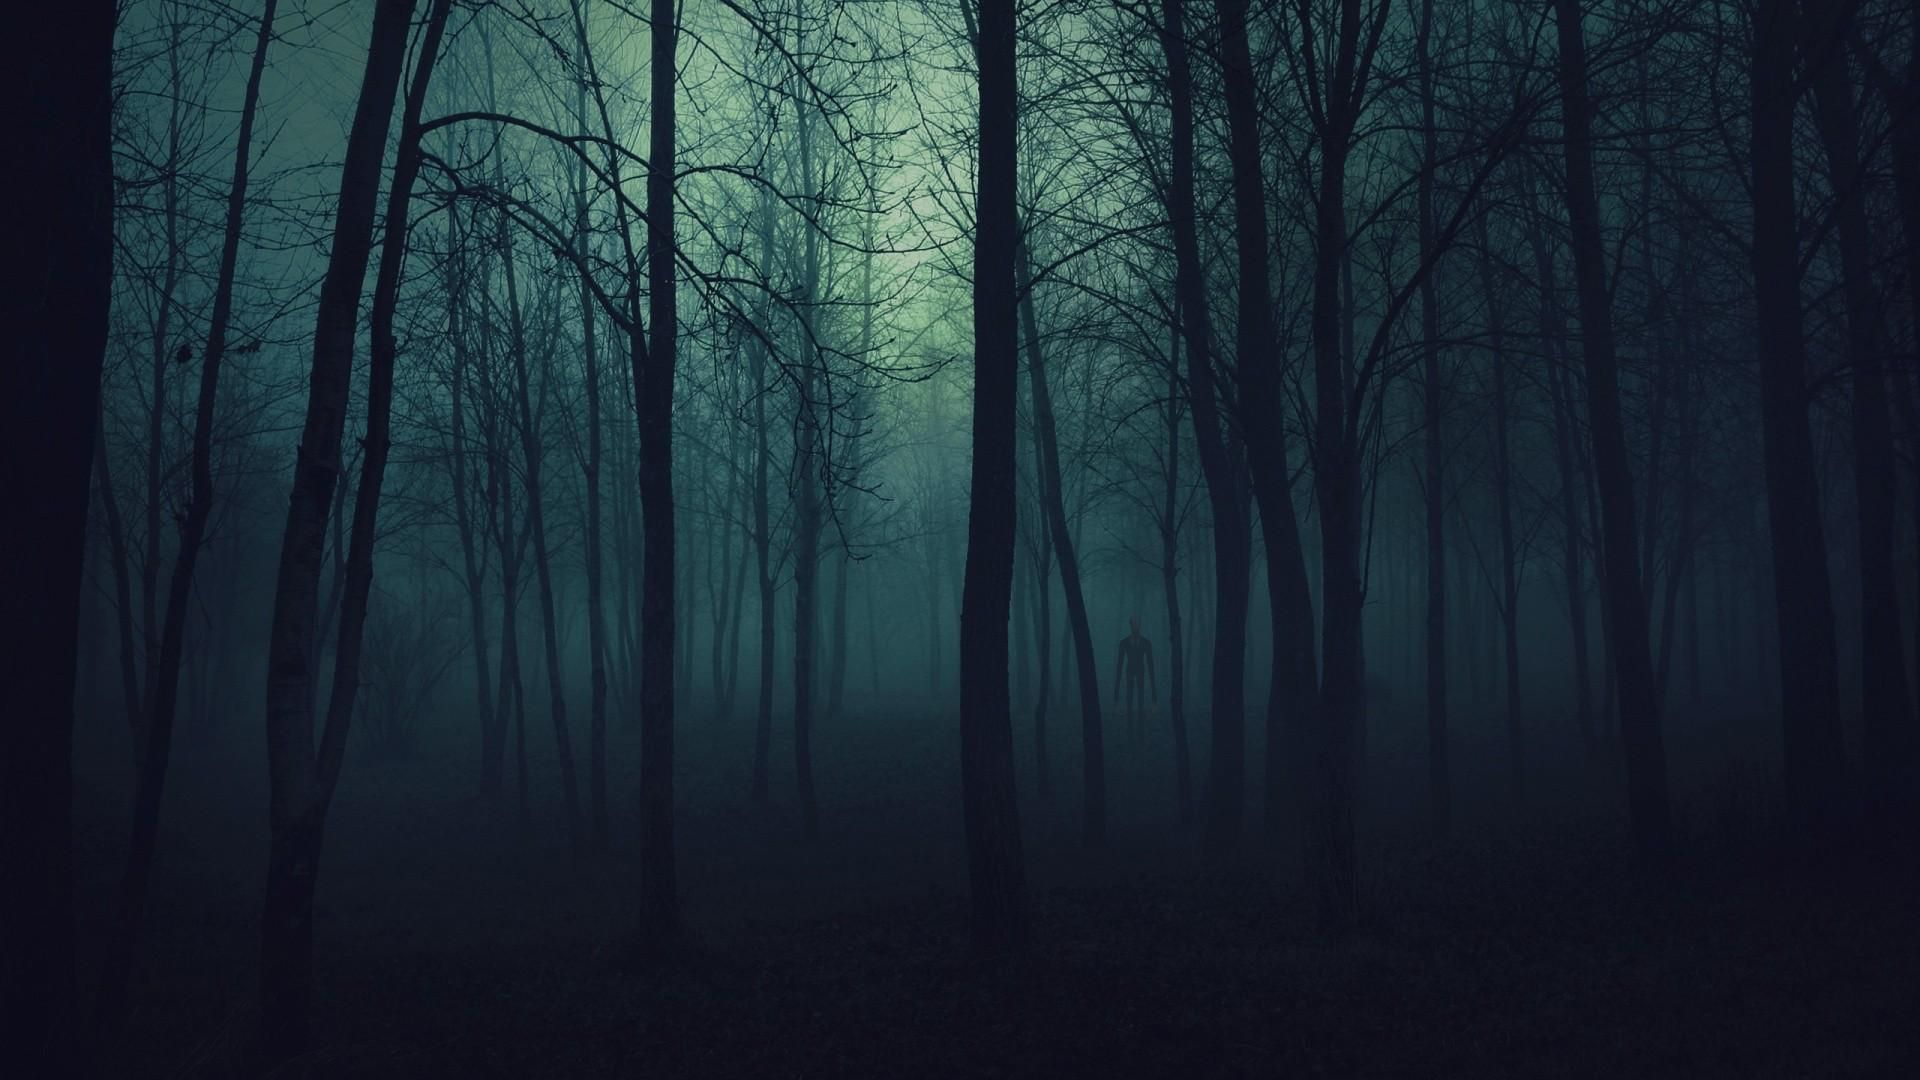 Http Slender Men Blogspot Com Slenderman Slender Creepy Scary Monster Creature Woods Crazy Dark Wood Background Forest Wallpaper Scary Backgrounds